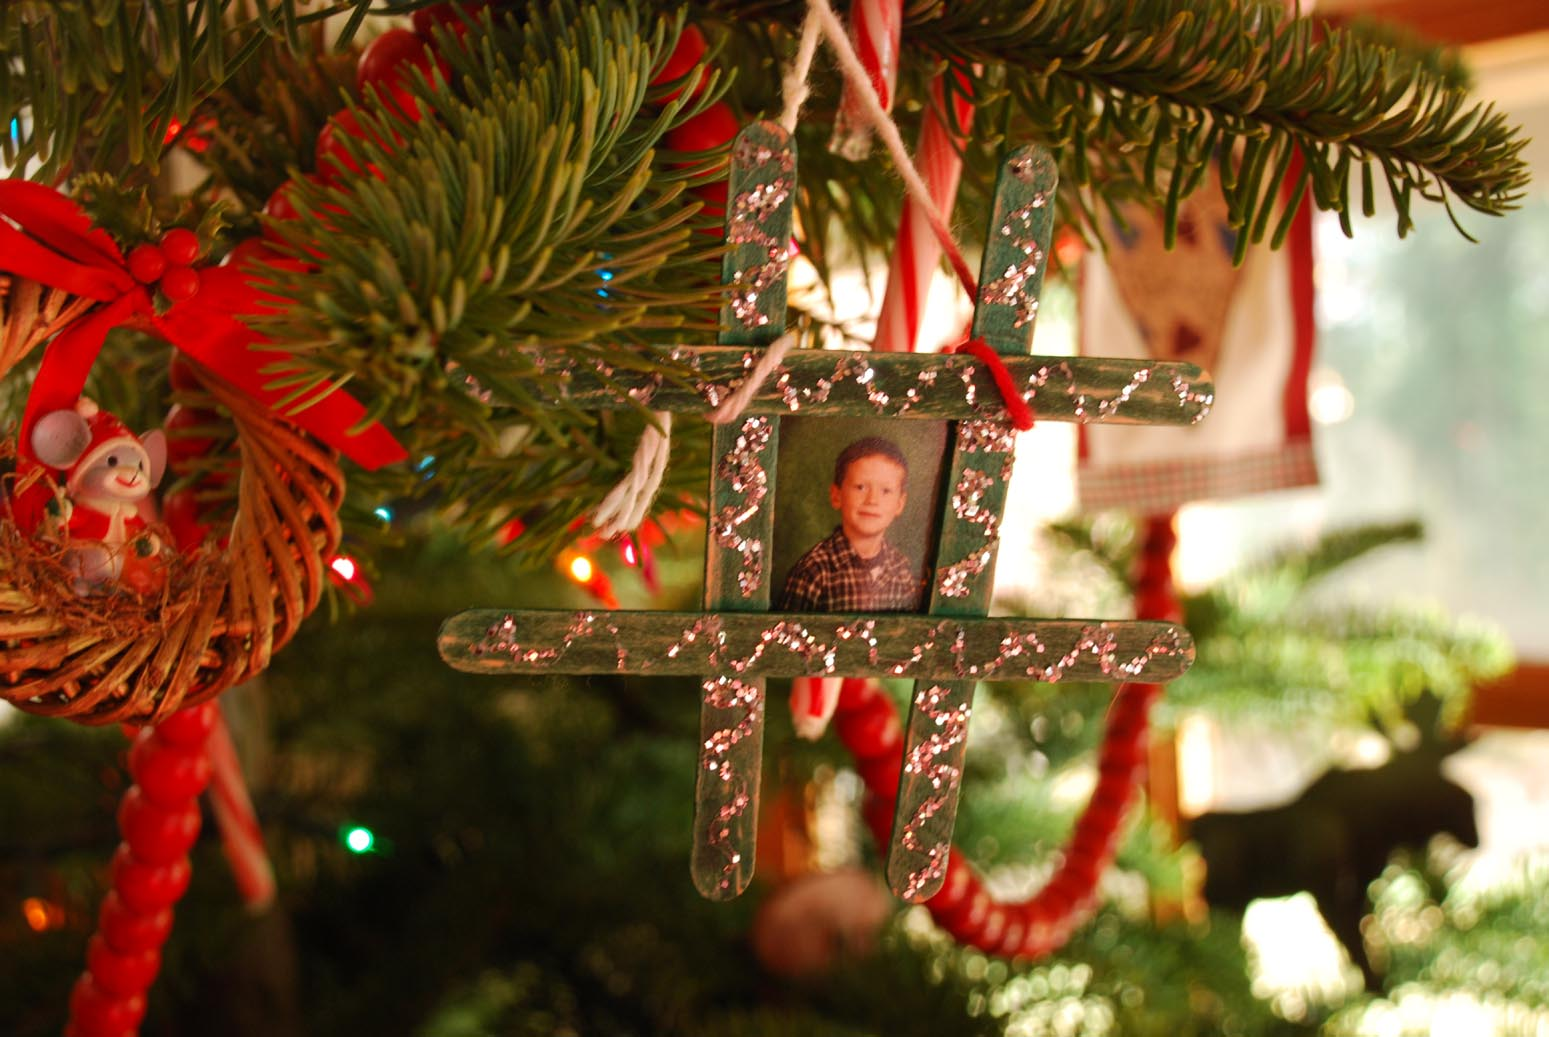 Applegarth farm christmas memories and decorations